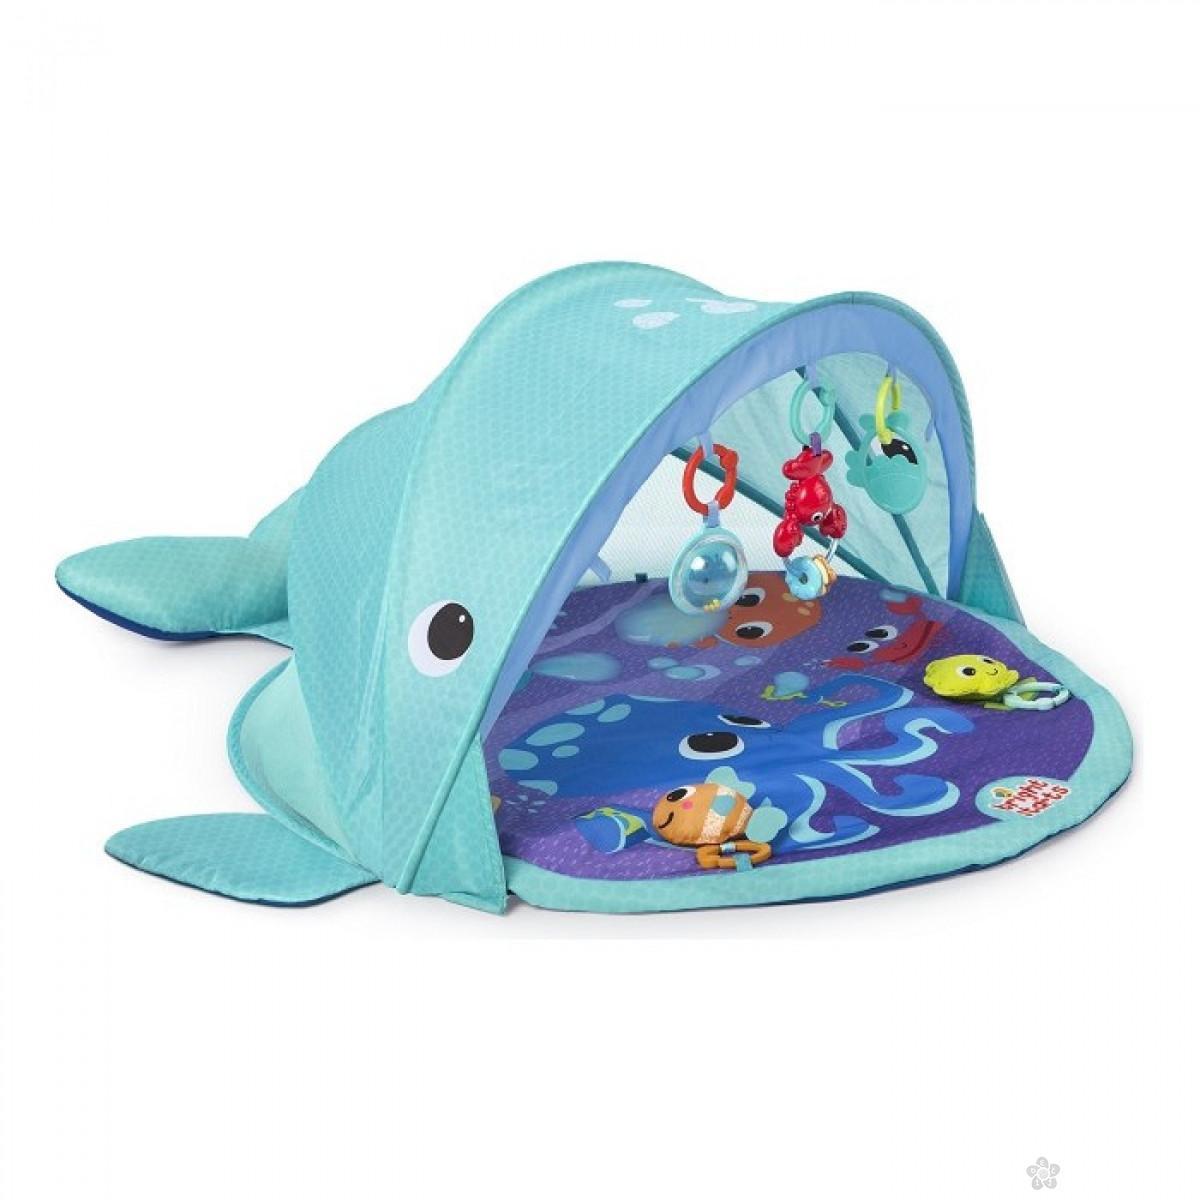 Podloga za igru Explore & Go Whale Gym